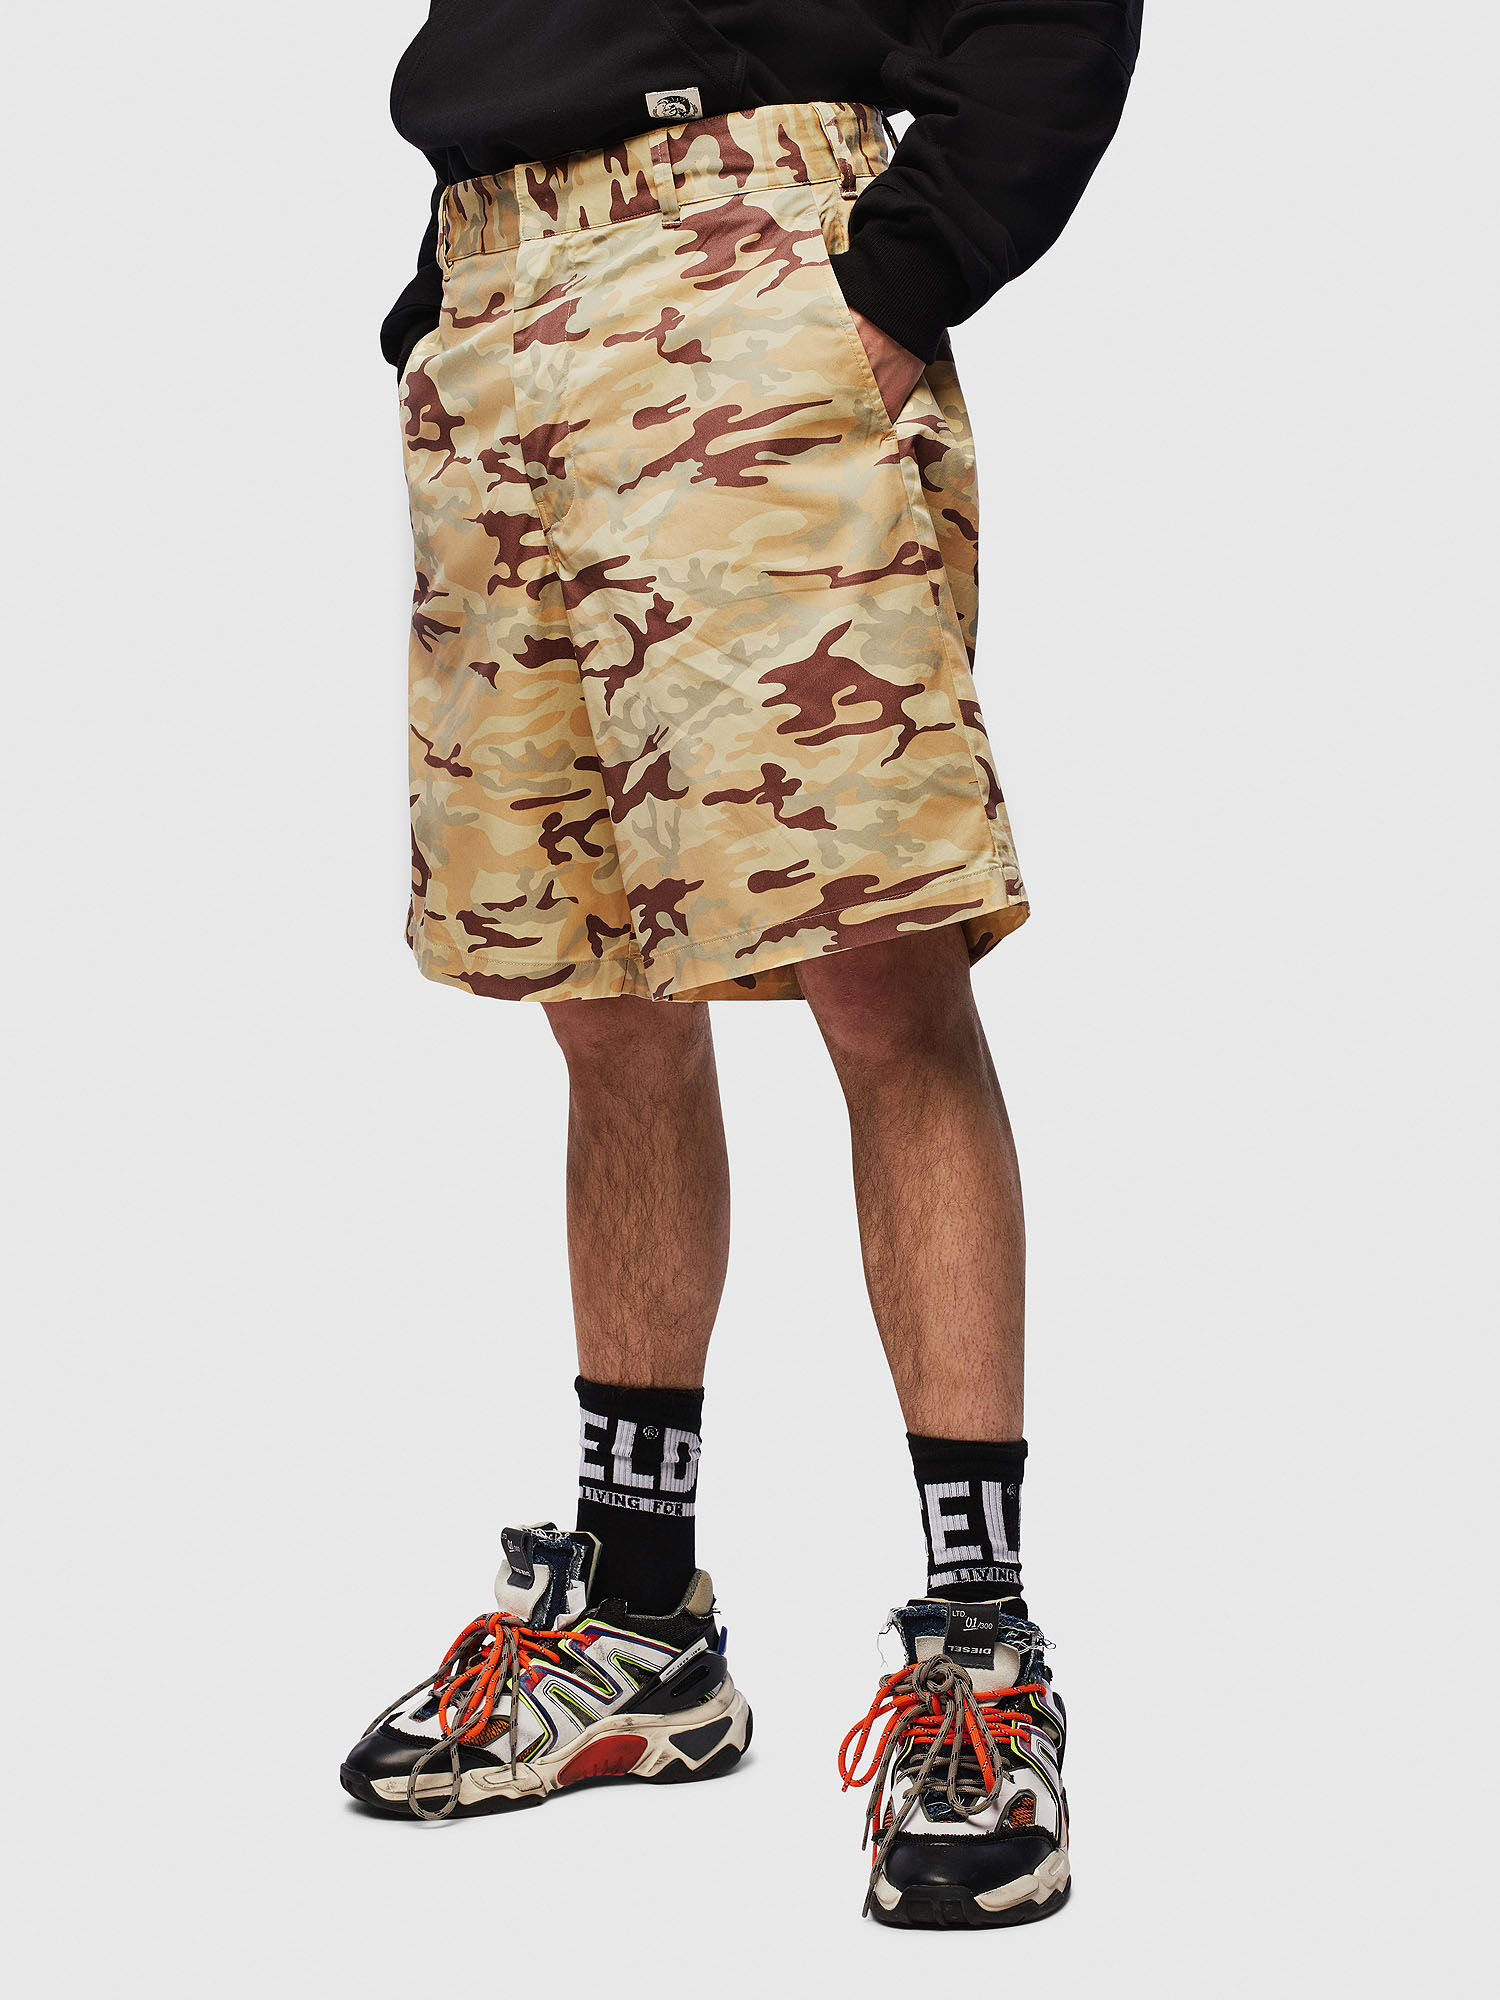 Uomo Chino Pant Pantaloni Tuta Tessuto Business Pantaloni Slim Fit